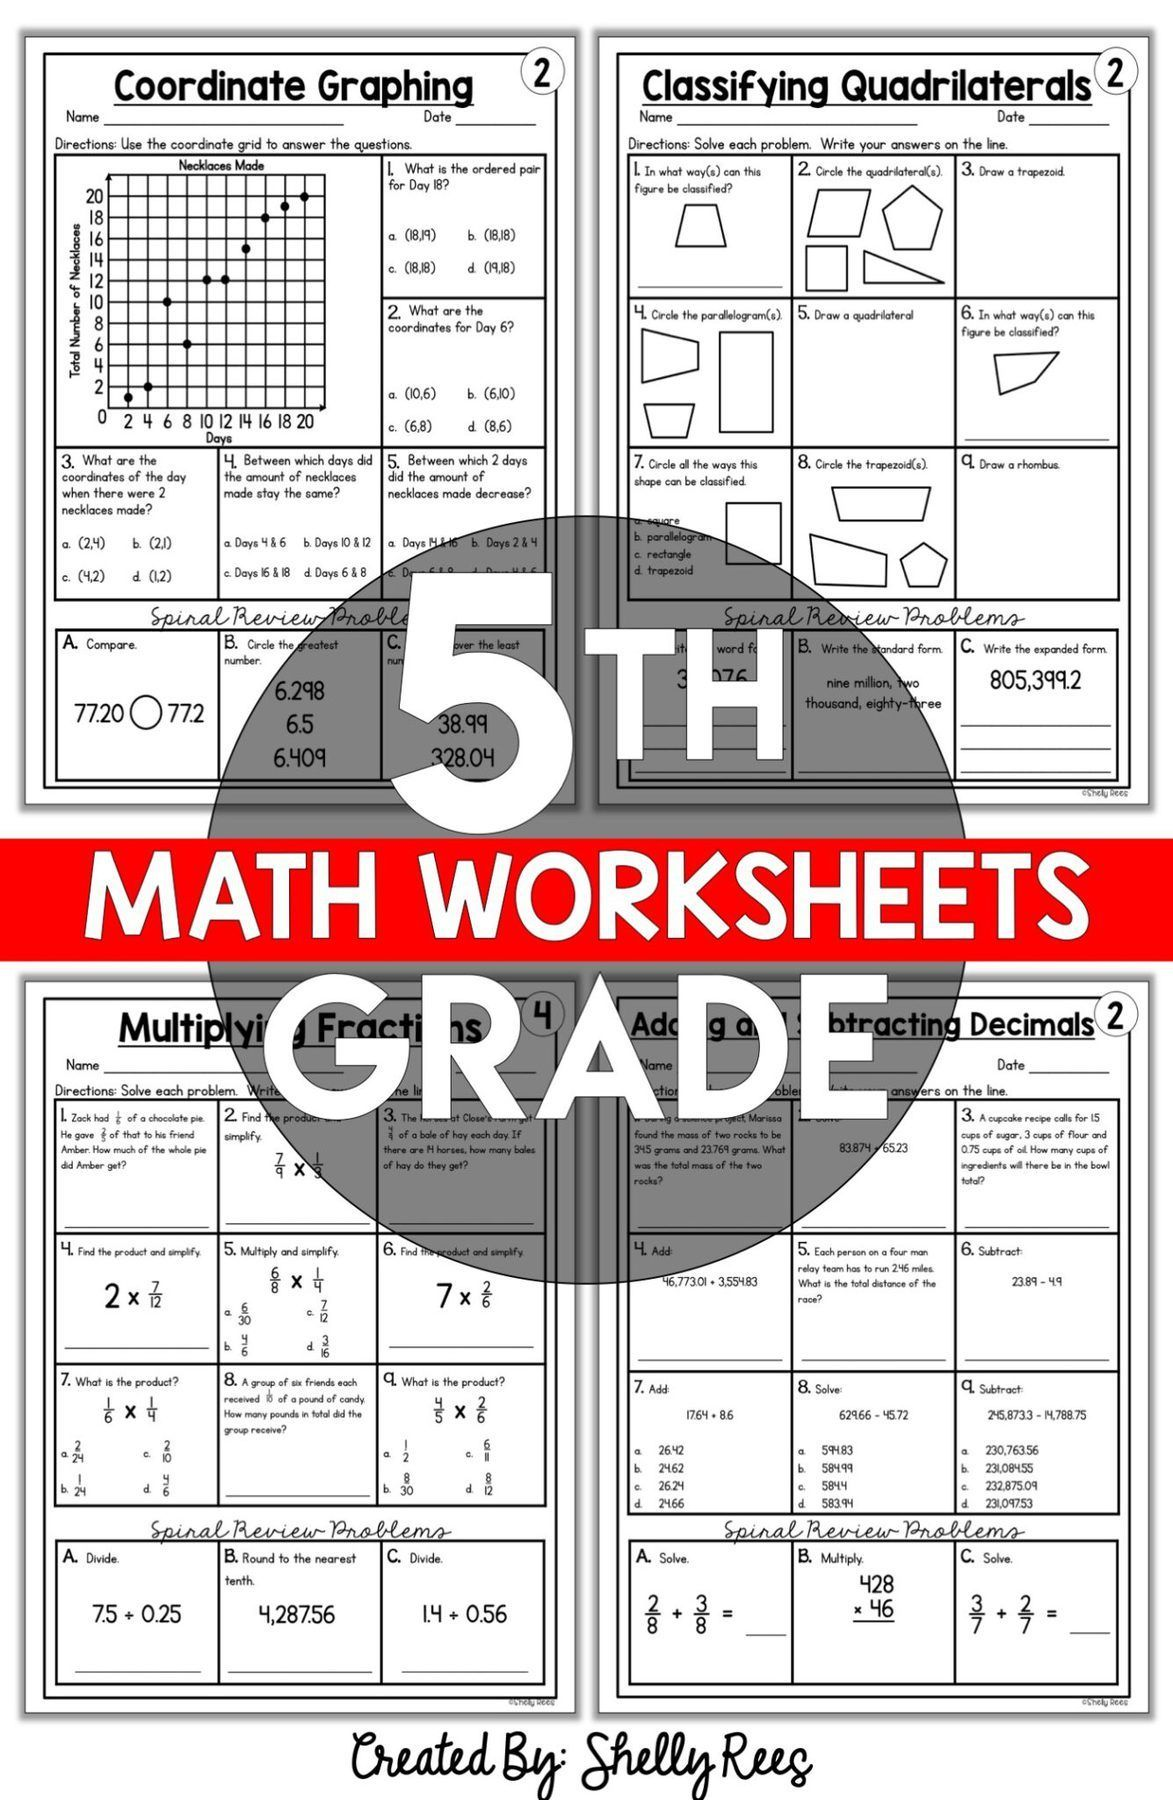 5th Grade Math Worksheets Free And Printable Appletastic Learning 5th Grade Math Math Worksheets Grade 5 Math Worksheets